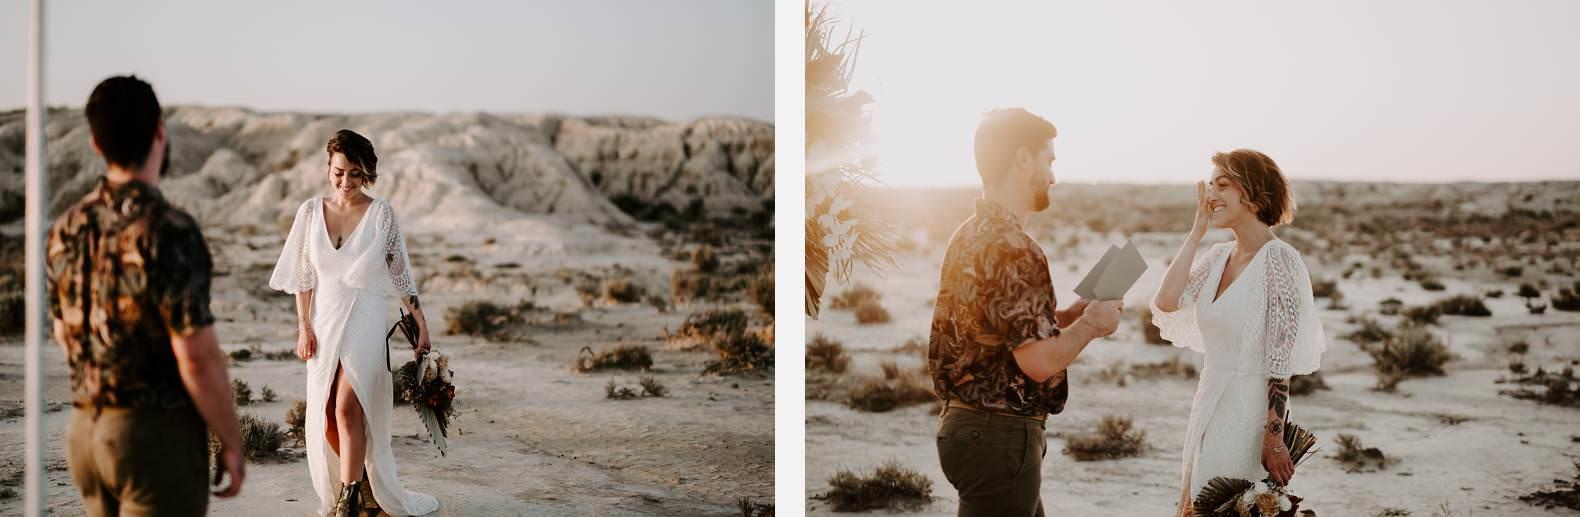 mariage espagne bardenas festival you and me elopement photographe bel esprit desert 0043